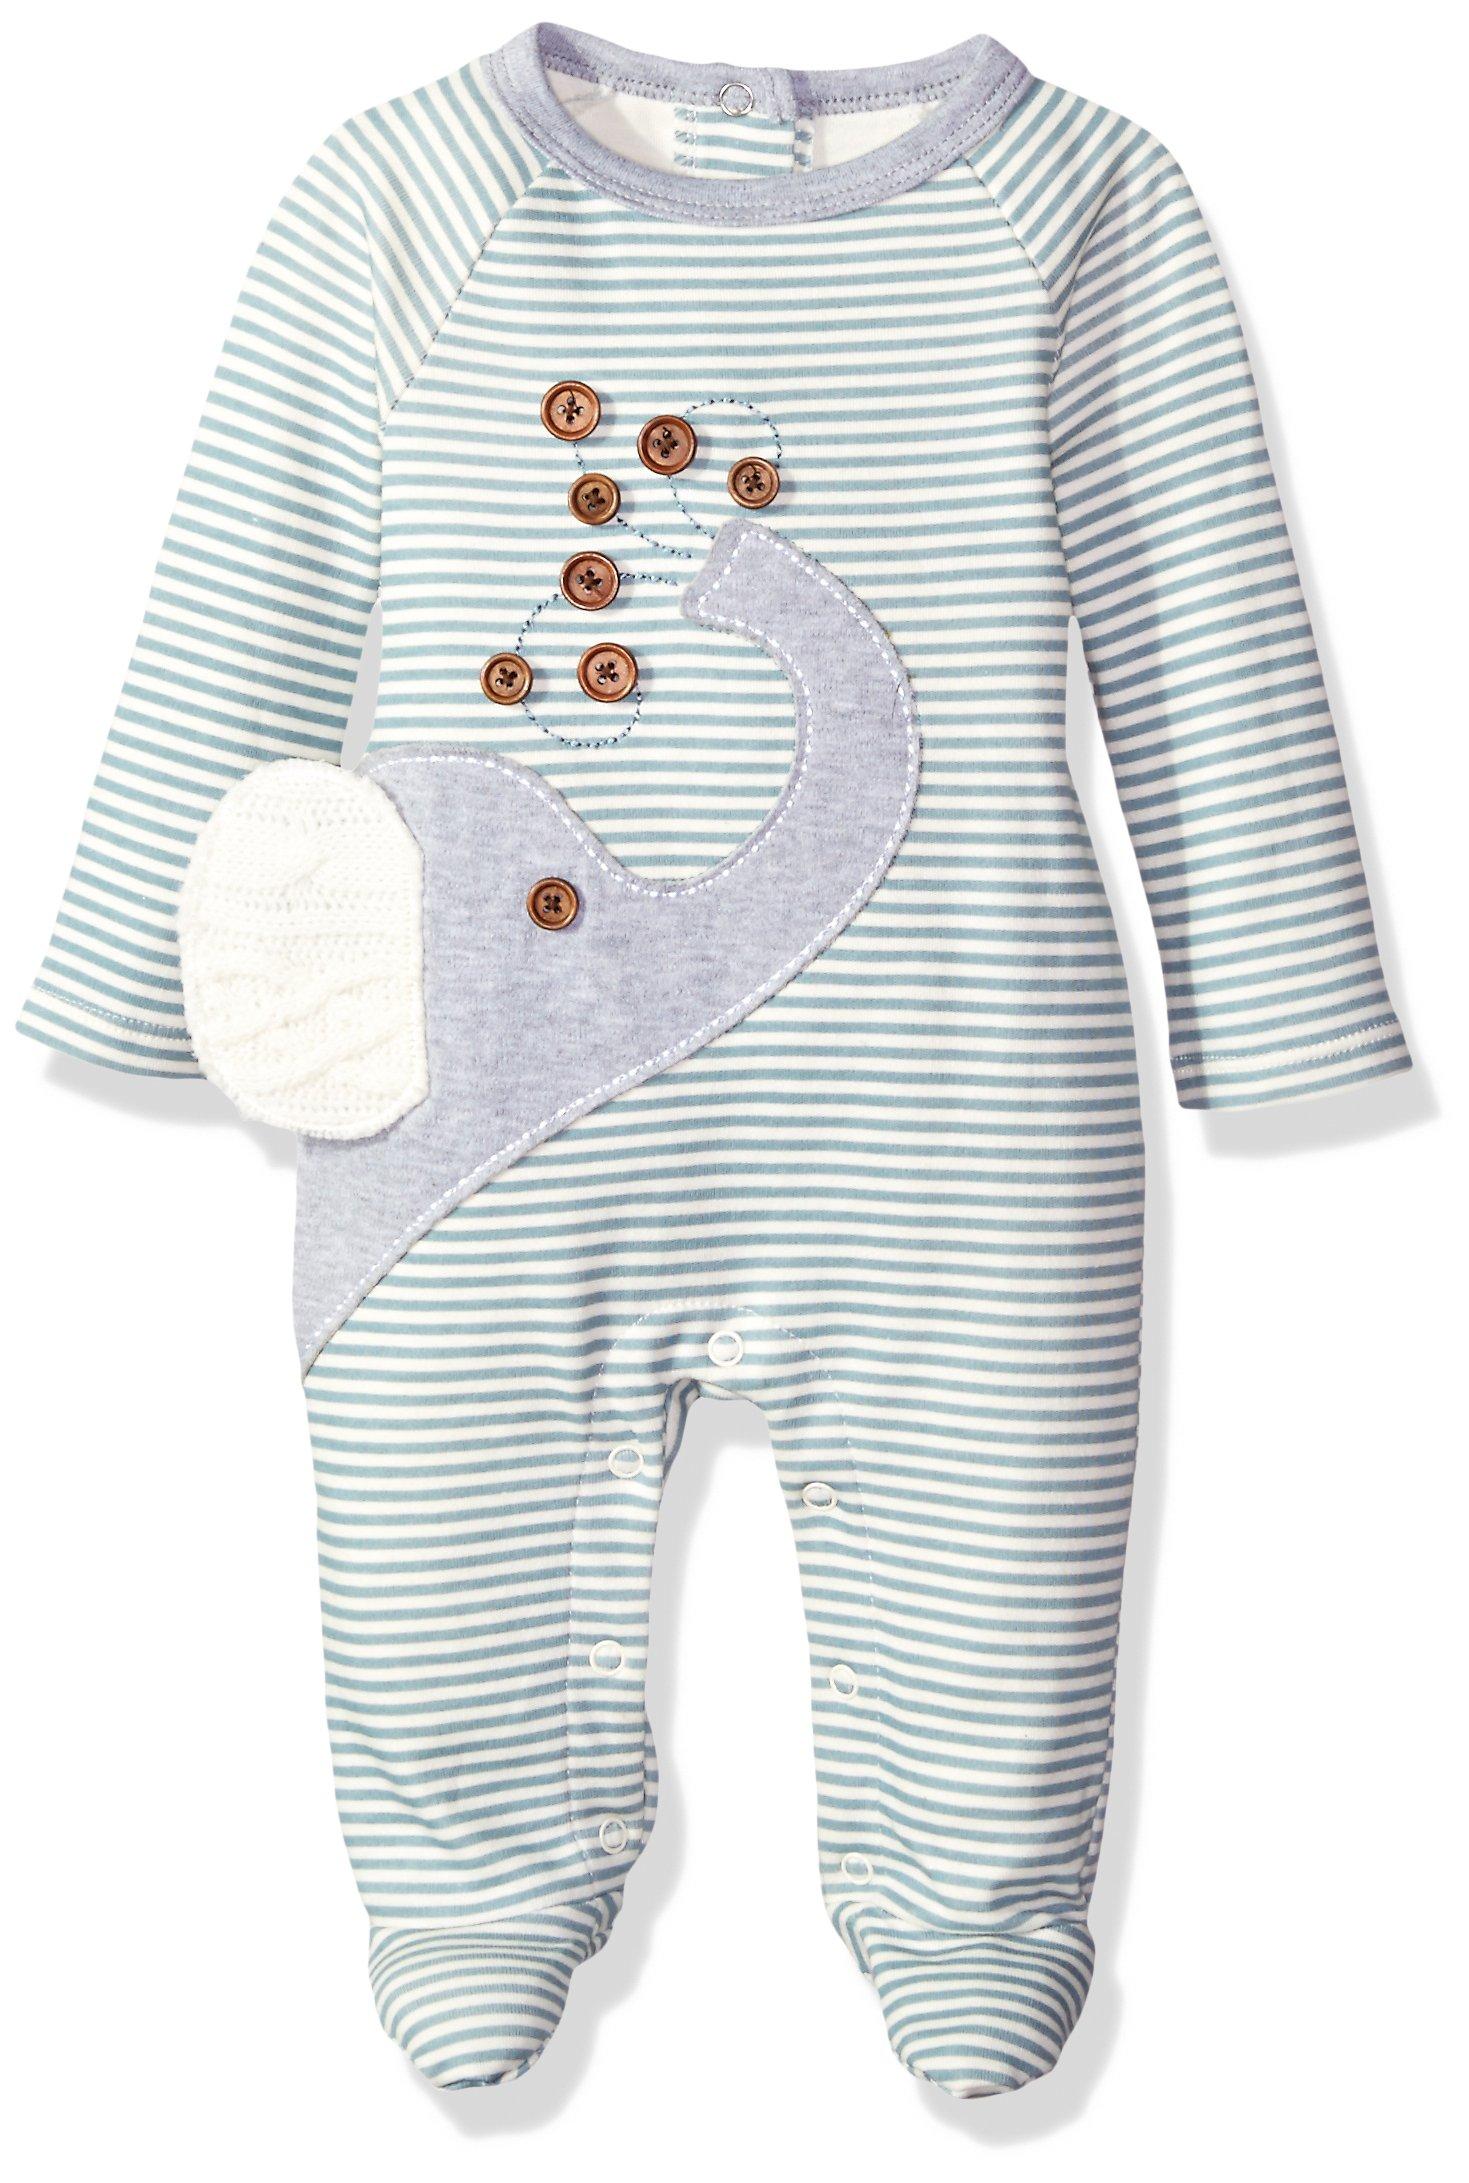 Mud Pie Baby Star Striped One Piece Footed Sleeper, Elephant, 0-3 Months